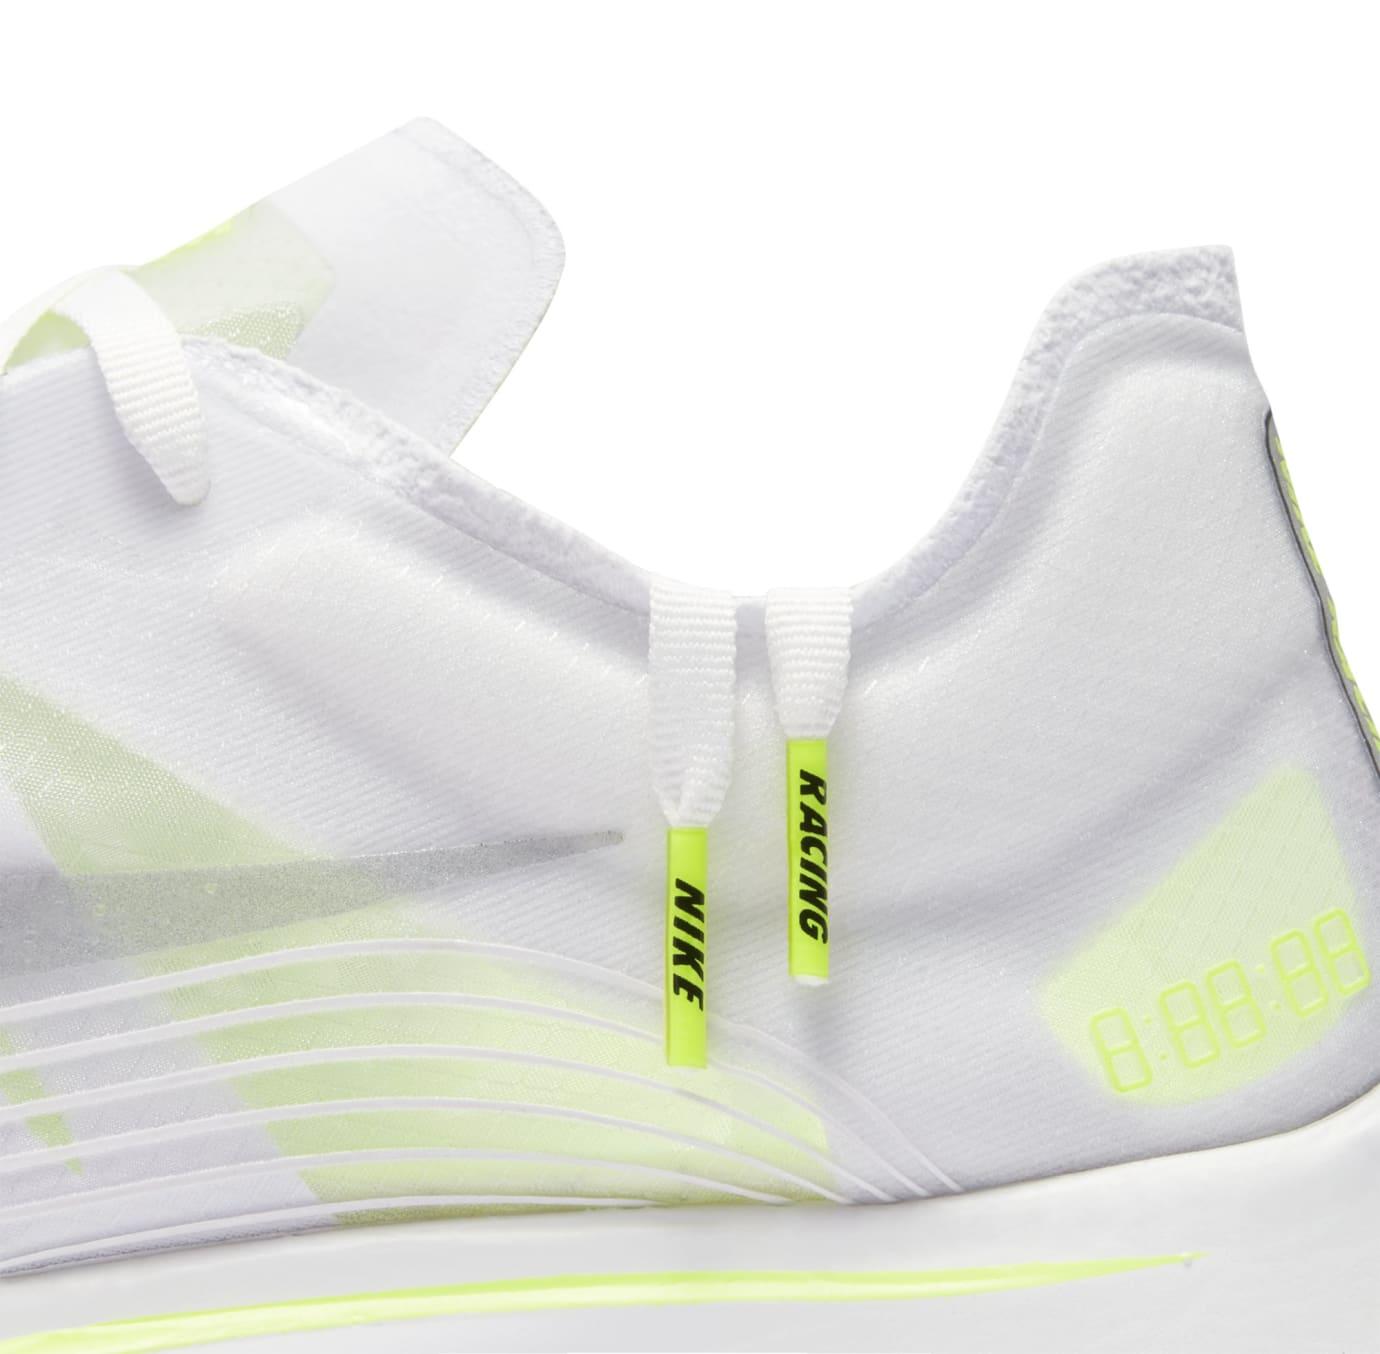 Nike Zoom Fly SP 'White/Volt/Glow' AJ9282-107 (Detail)